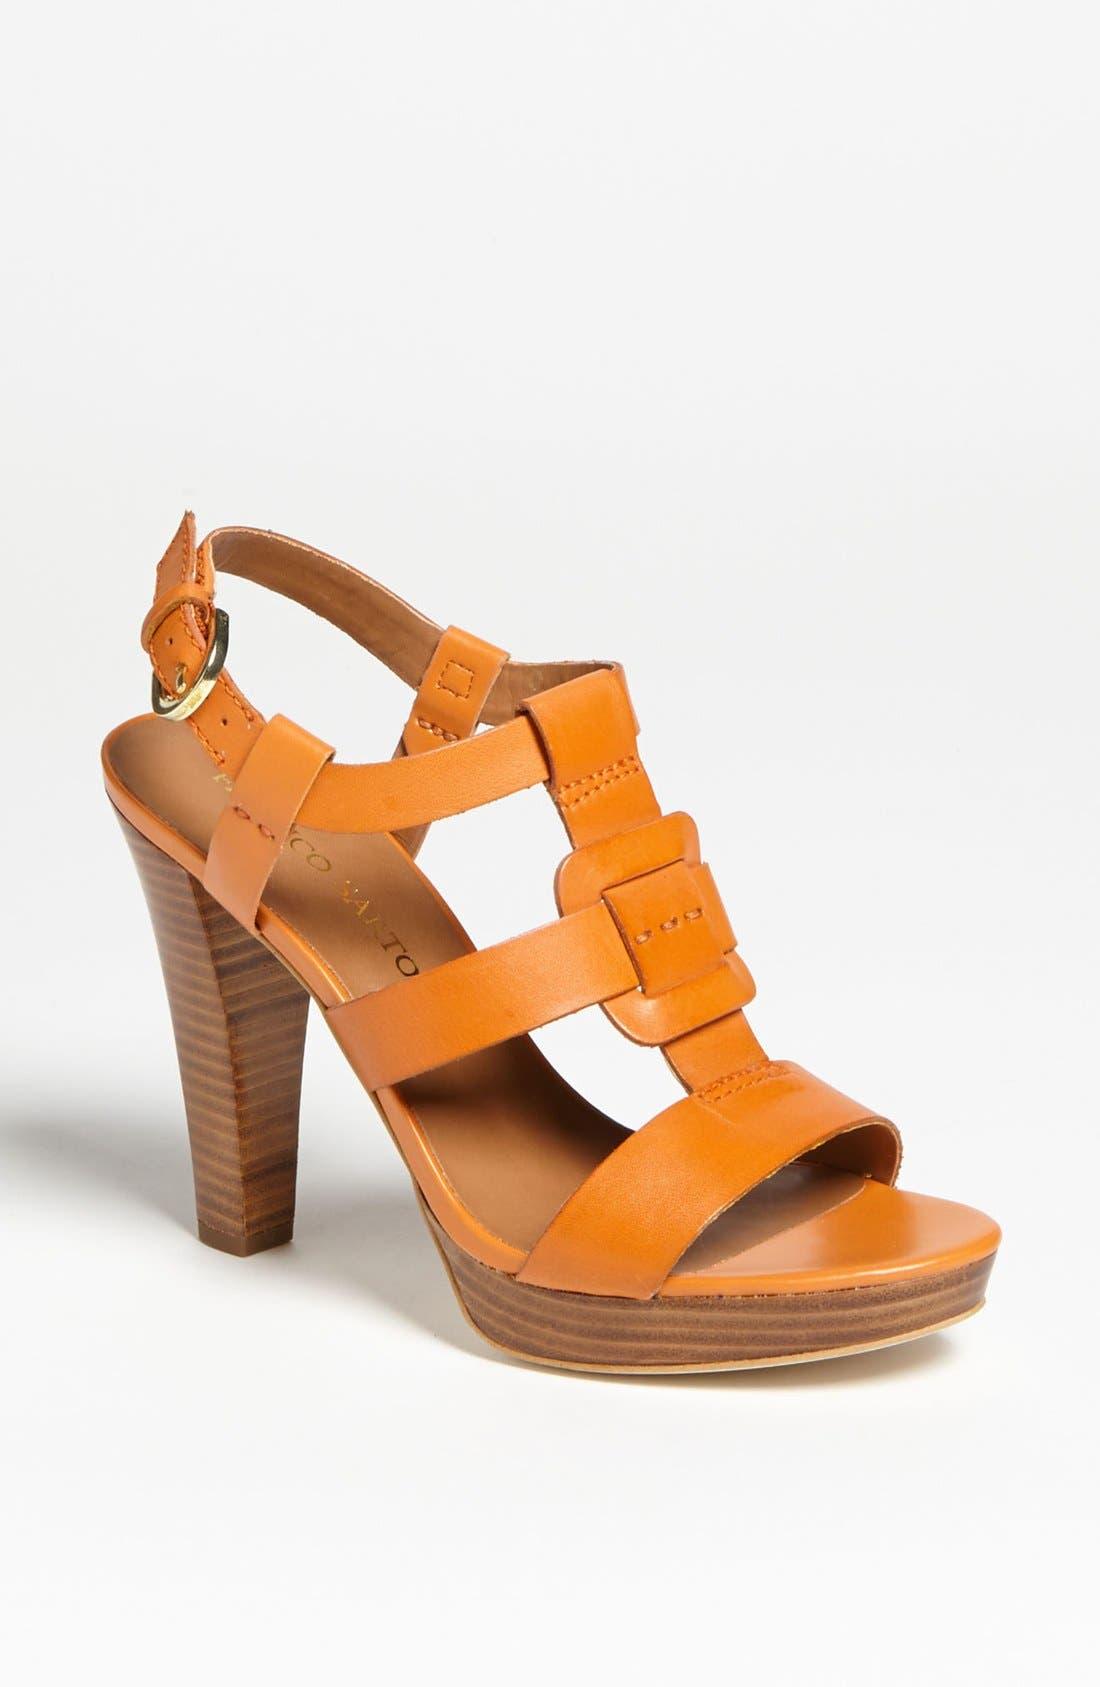 Alternate Image 1 Selected - Franco Sarto 'Betsy' Sandal